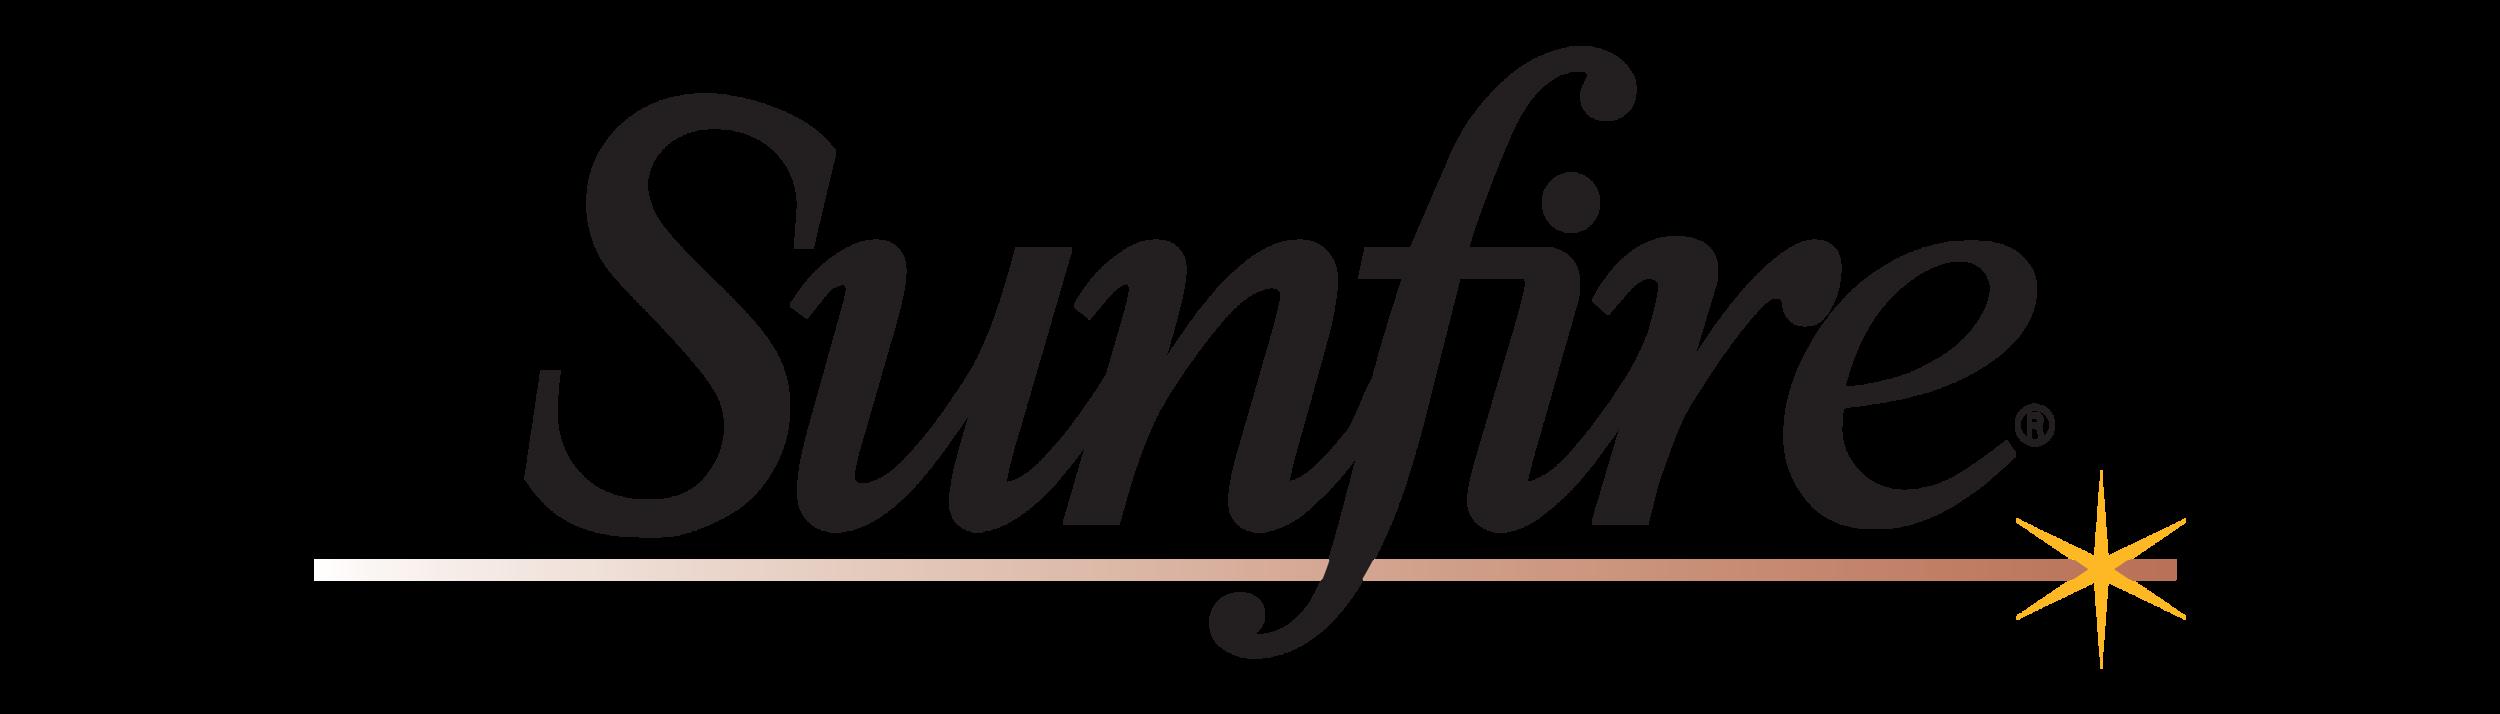 sunfire_logo.png